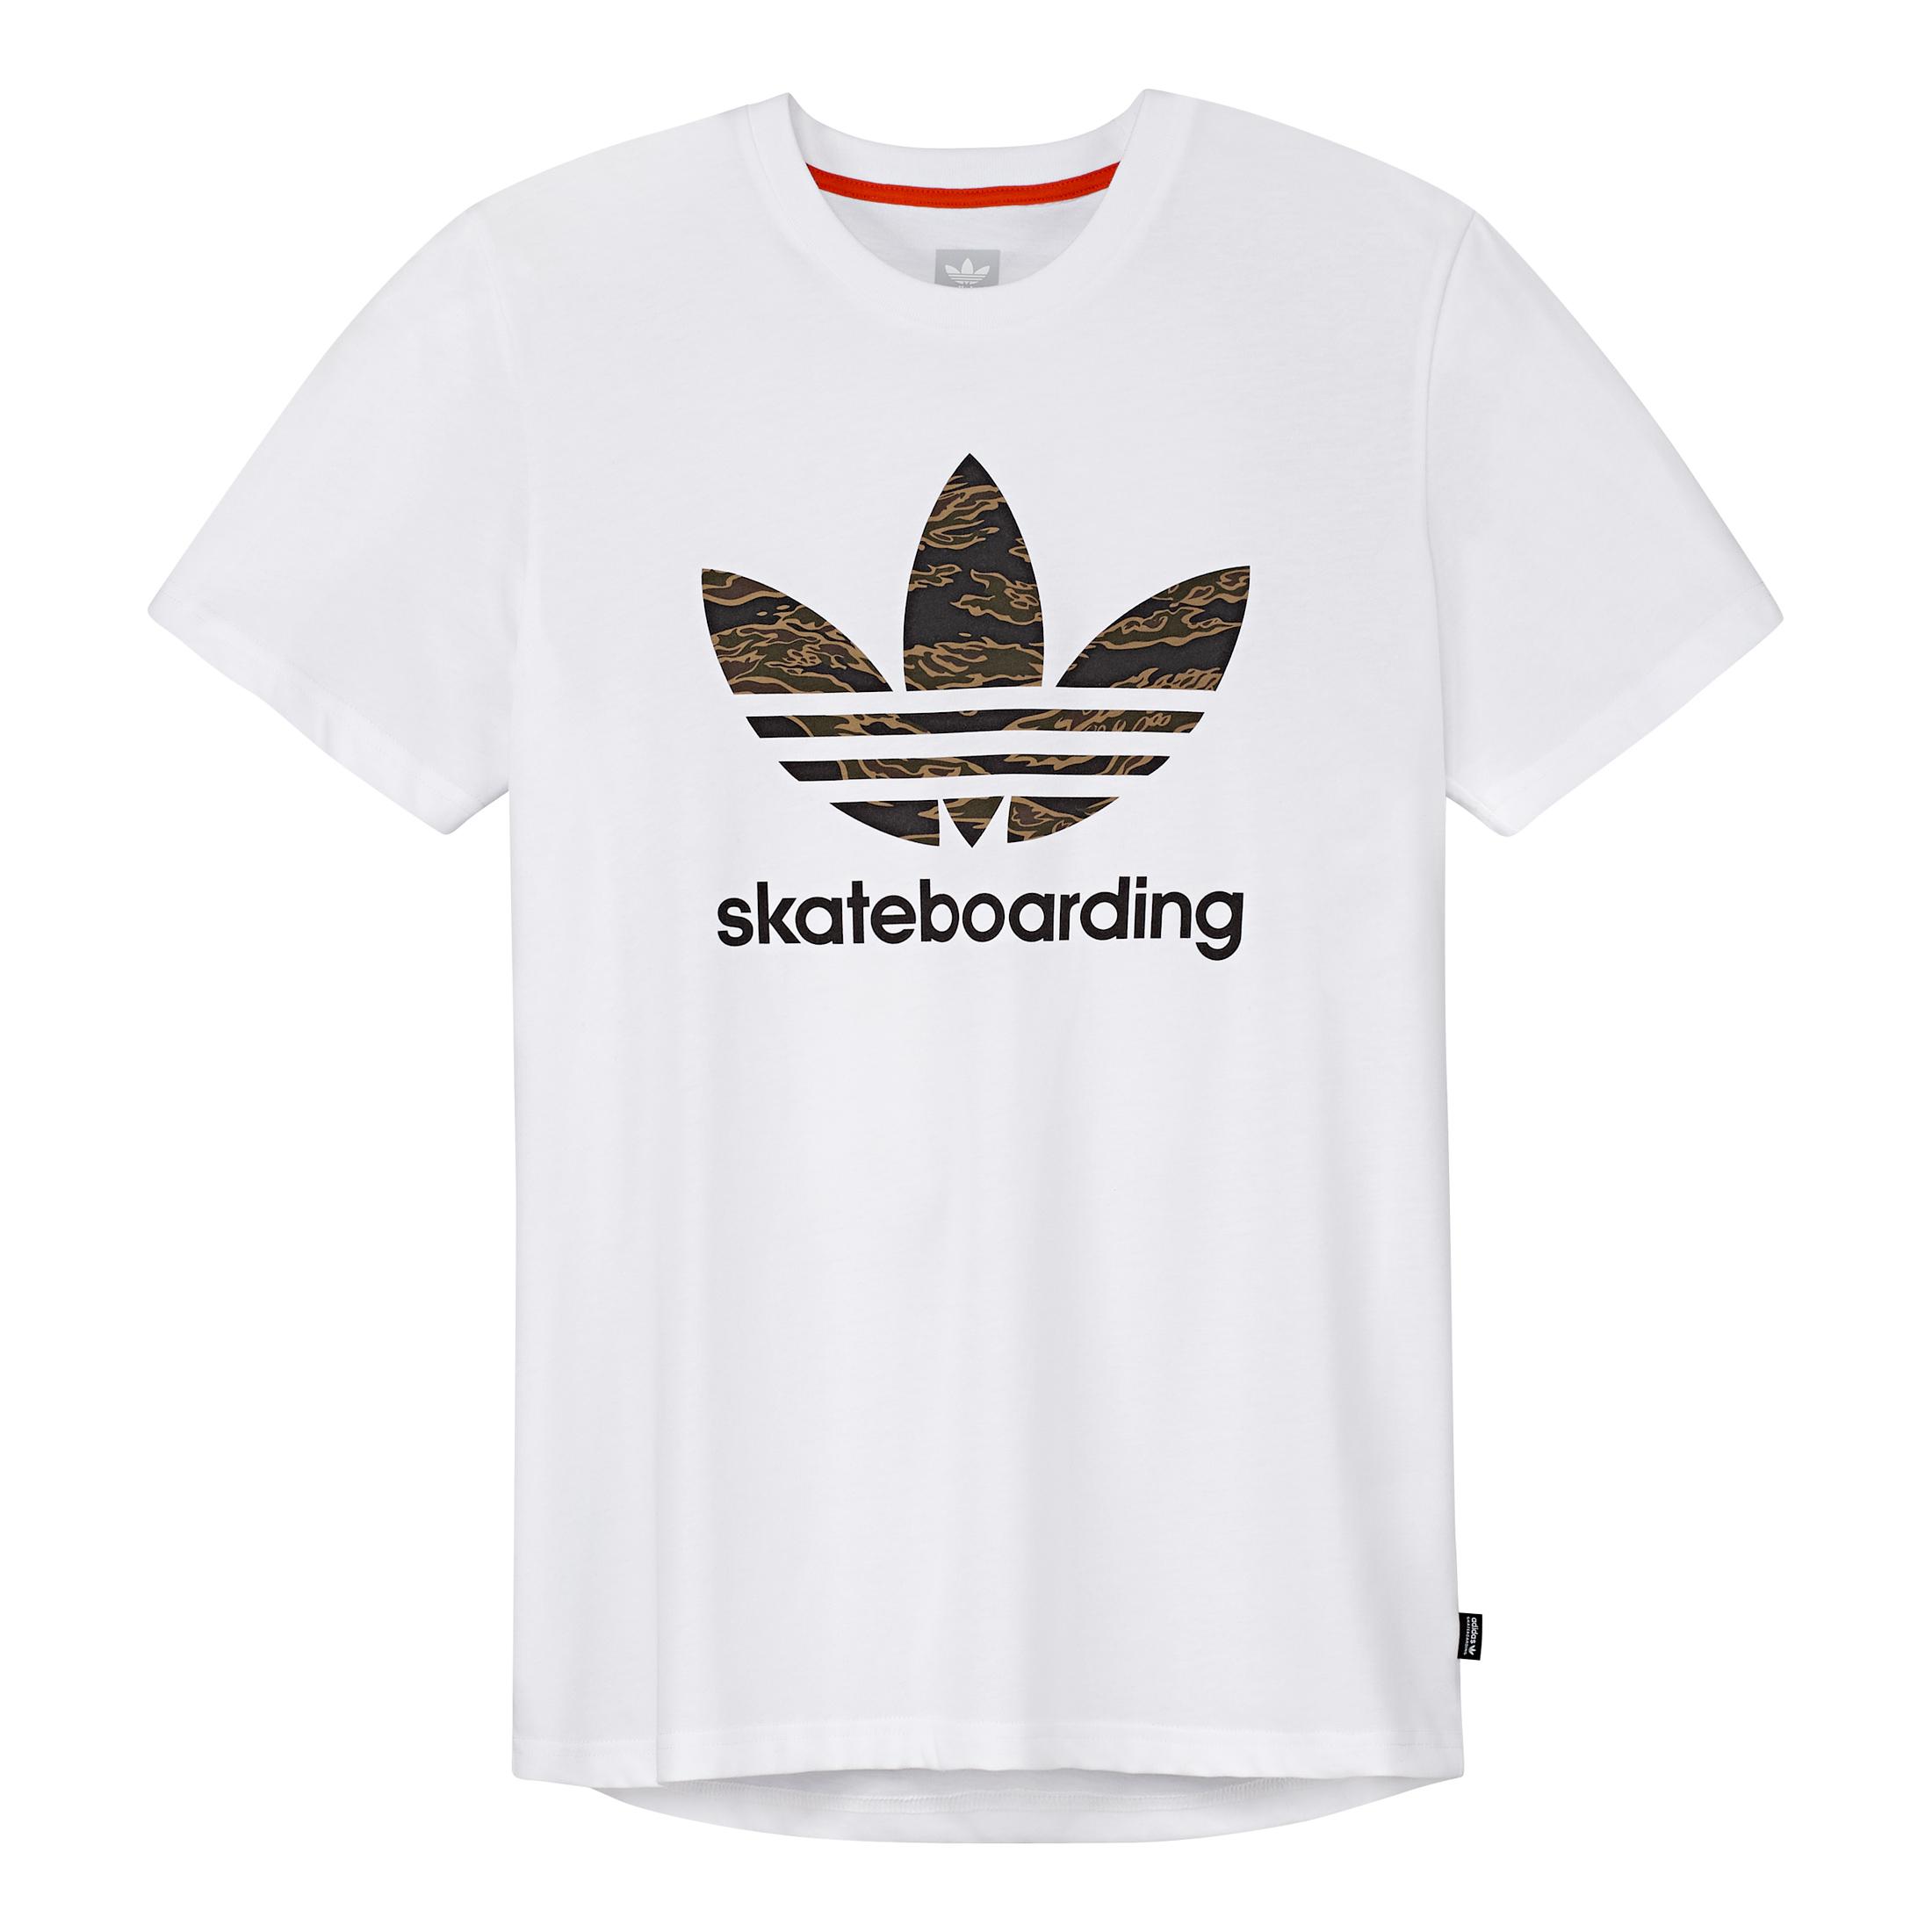 9fb441b724ad4c Adidas Skateboarding Camo BB Tee